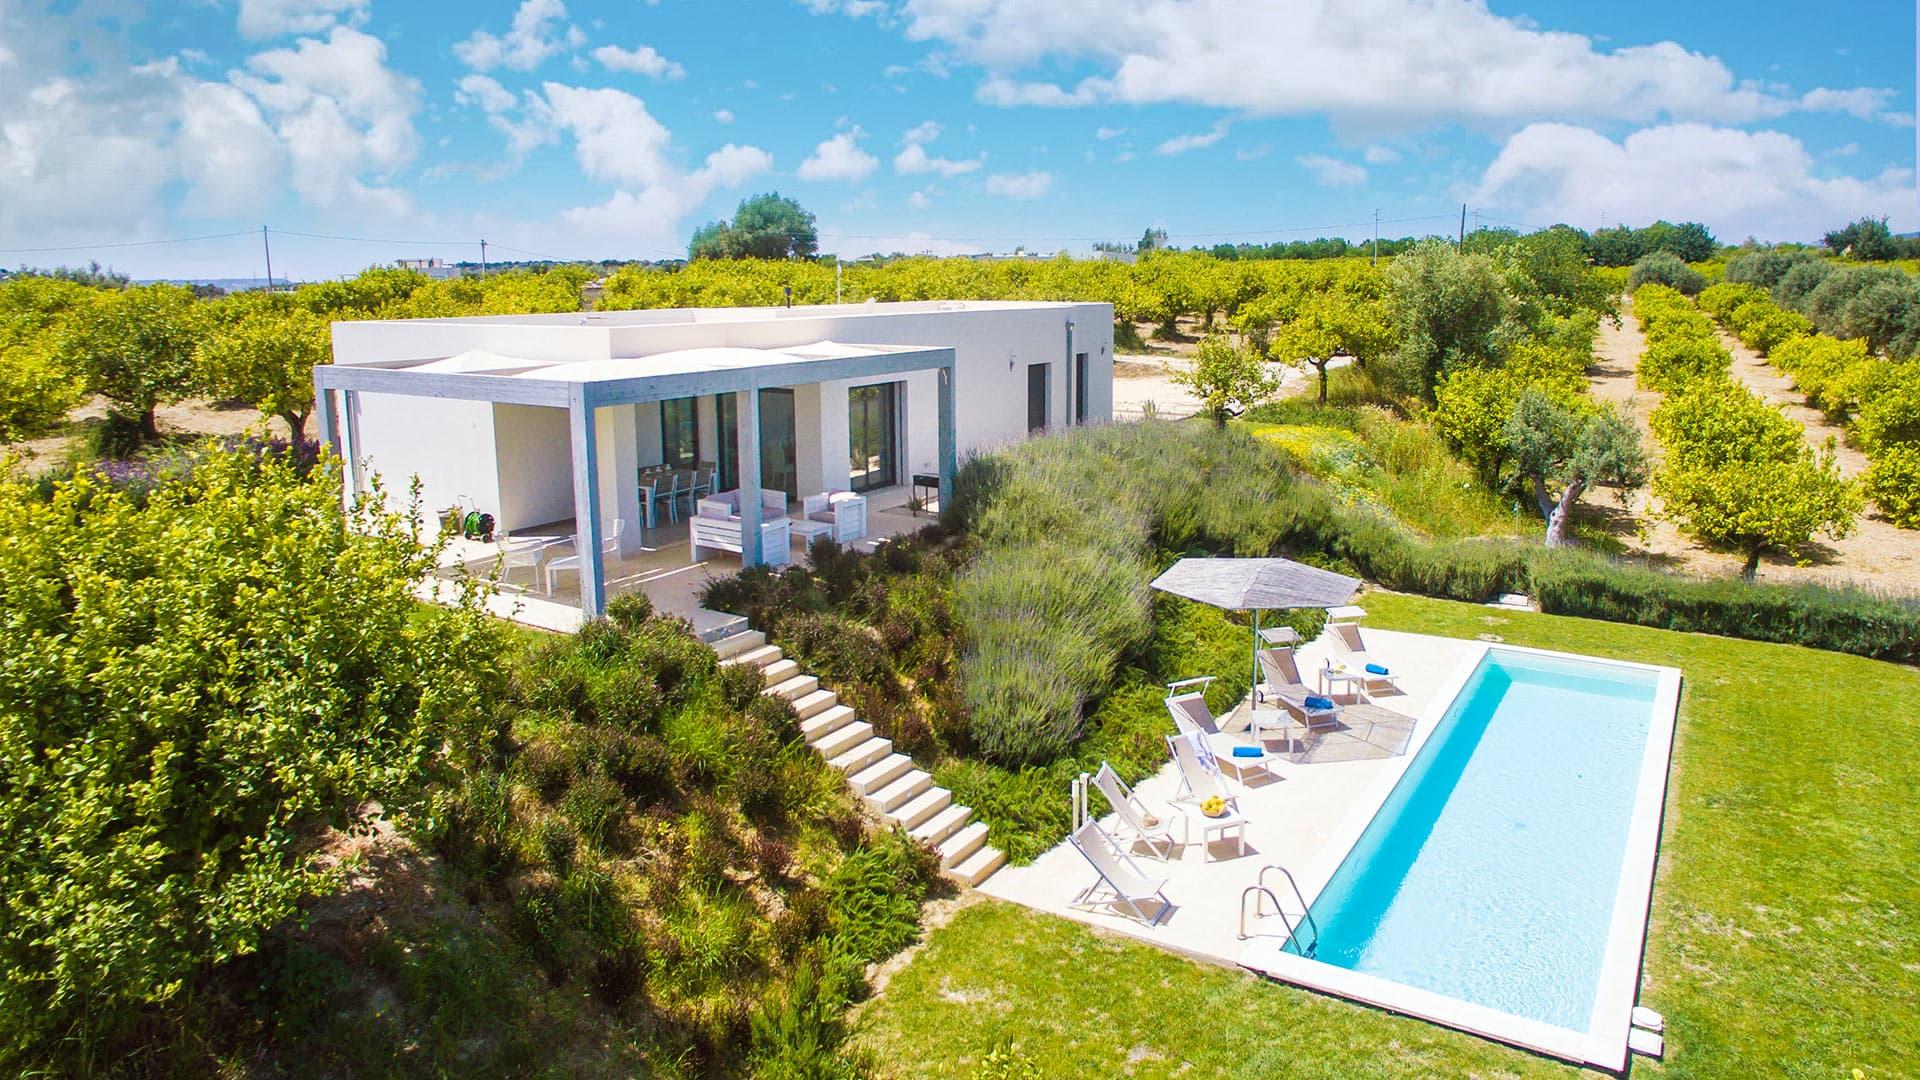 Villa Manele - Villa rental in Sicily, Sicily South ...